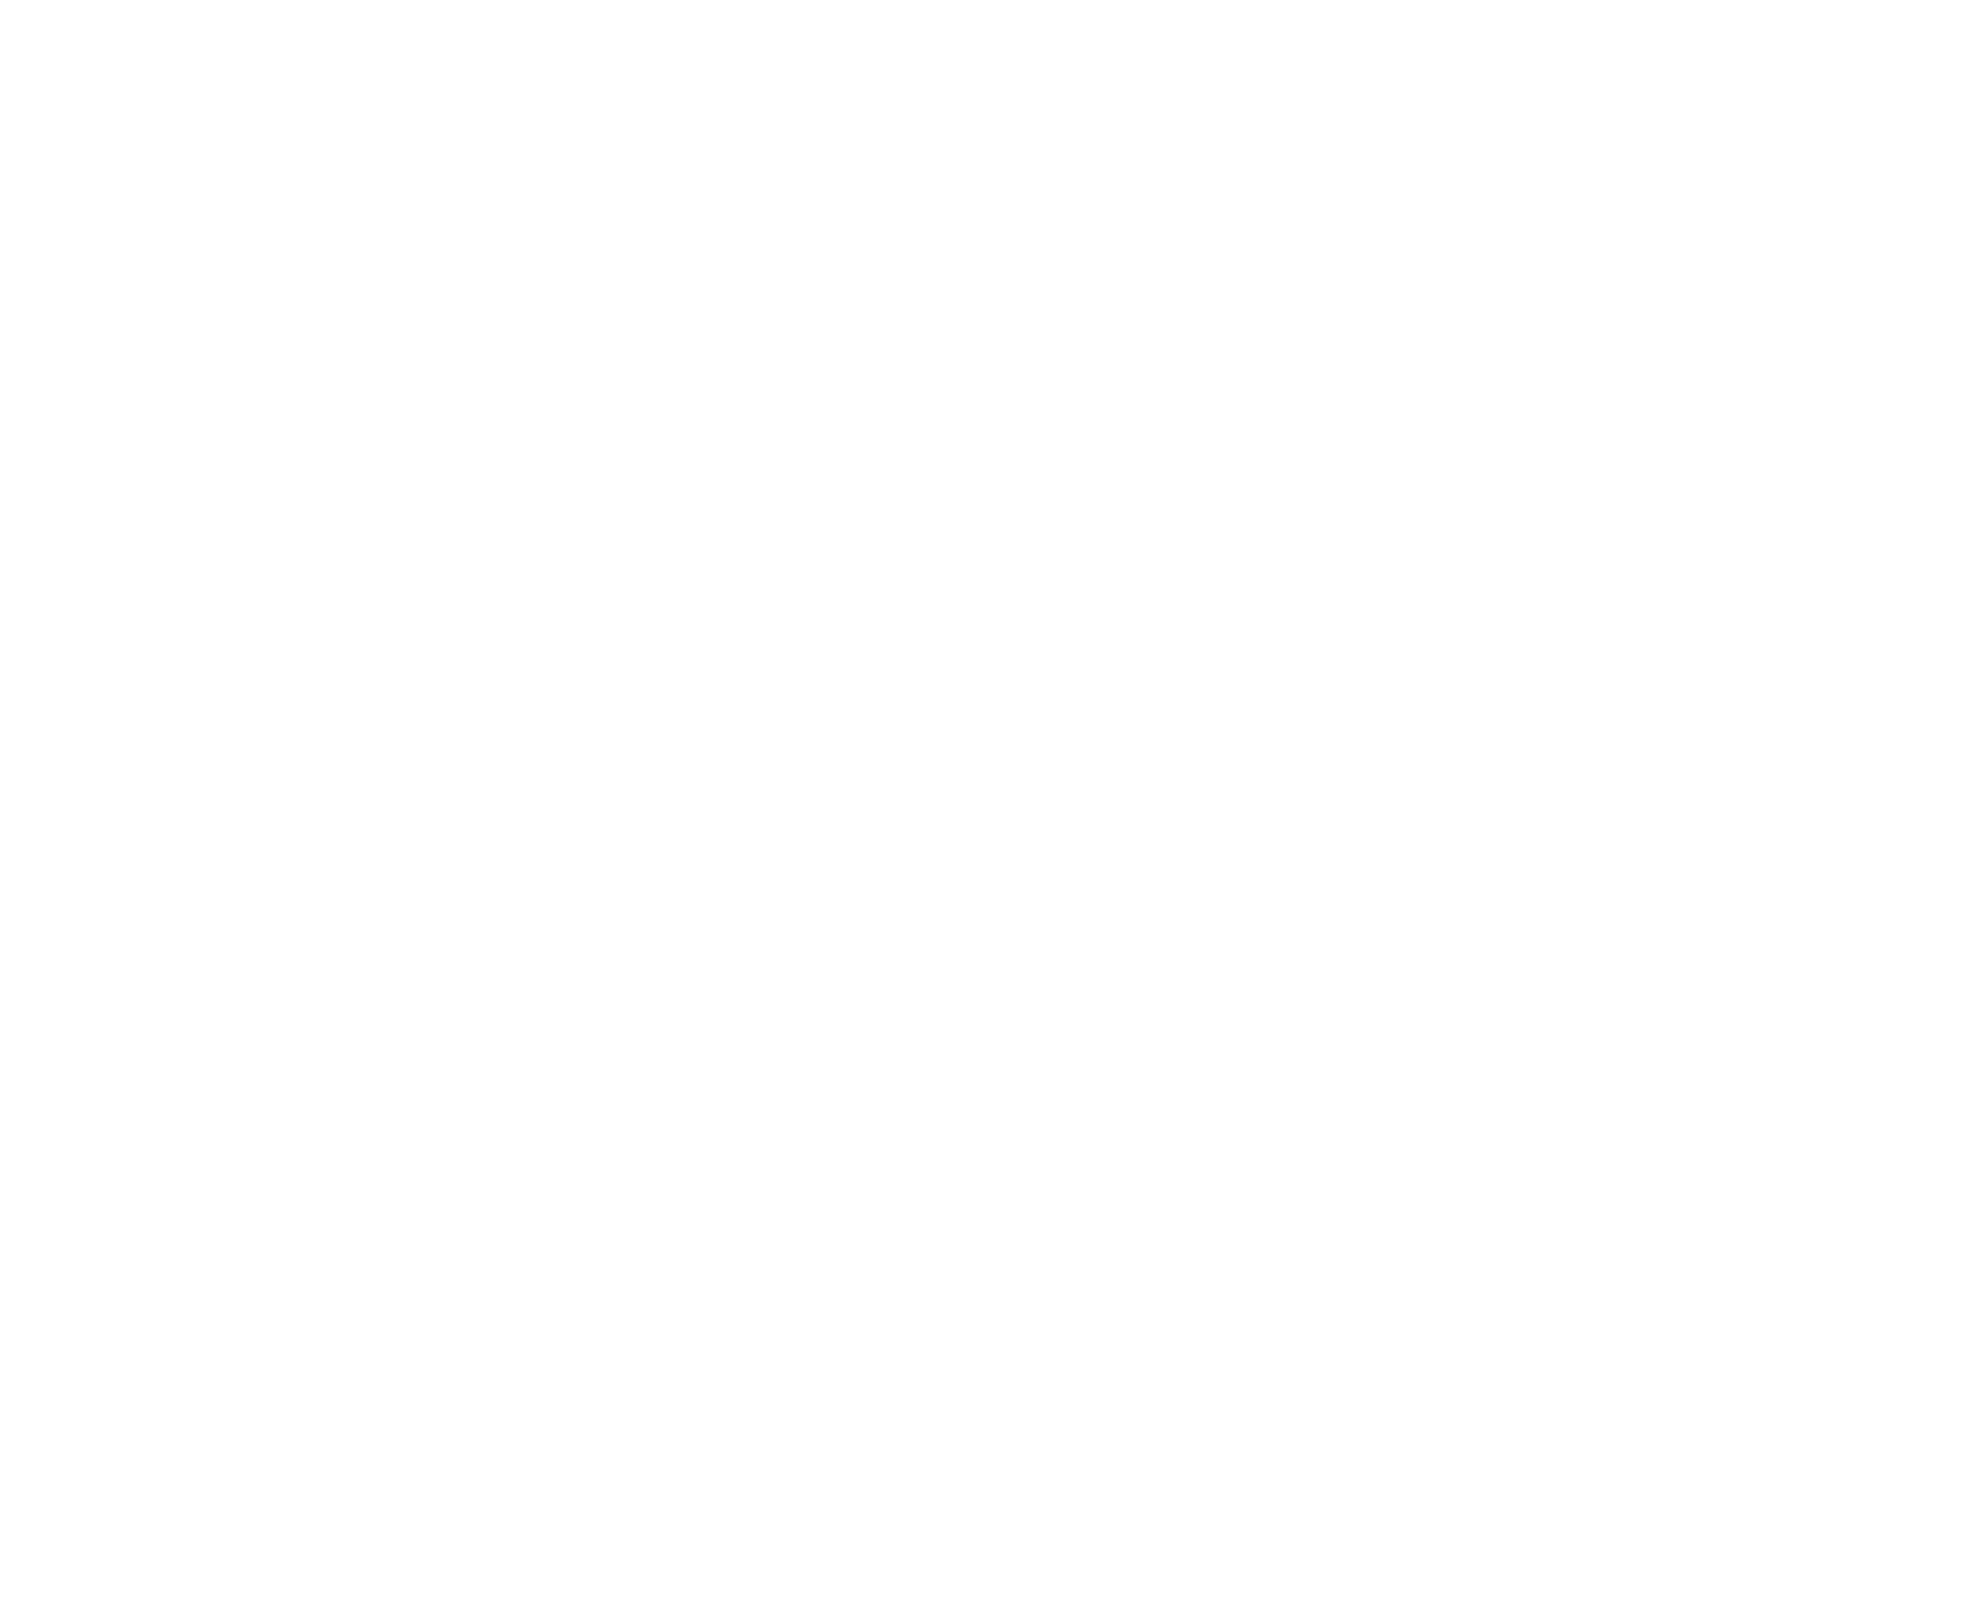 Frentic logo